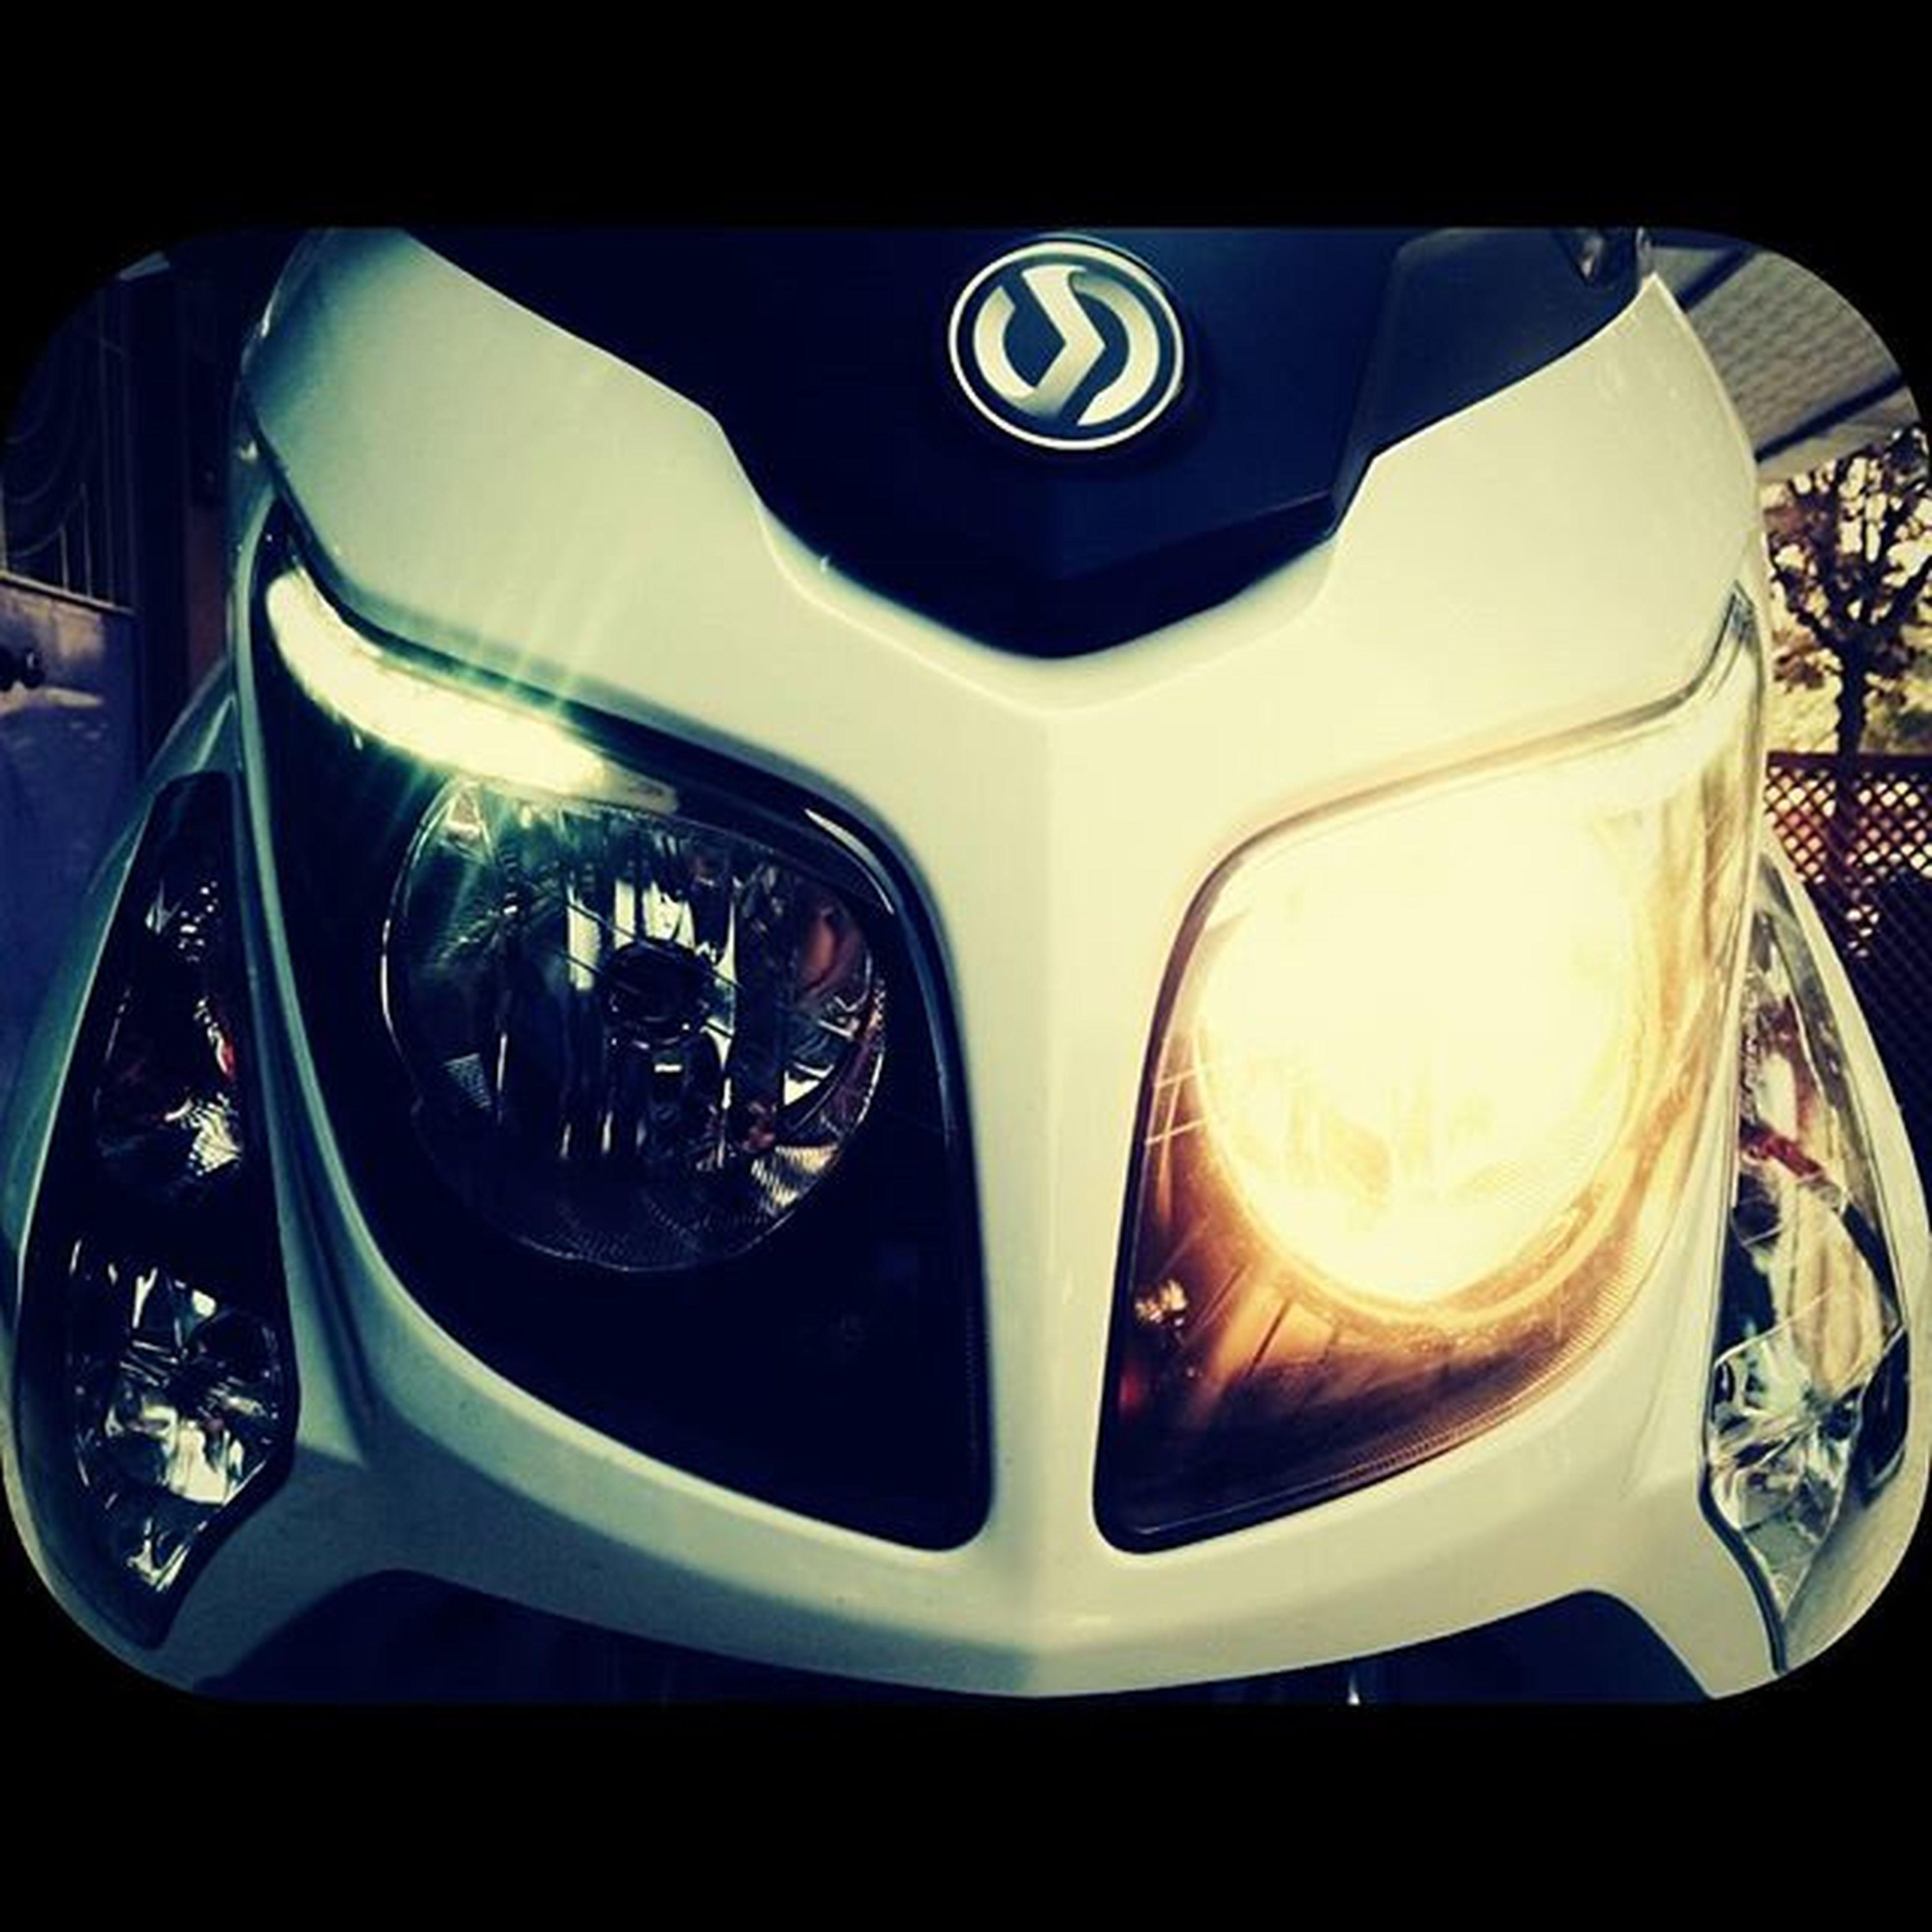 SYM Symtaiwan Symgts Motorcycle Moto Helmet Buff Scooter MaxiScooter 250ievo Phoenix